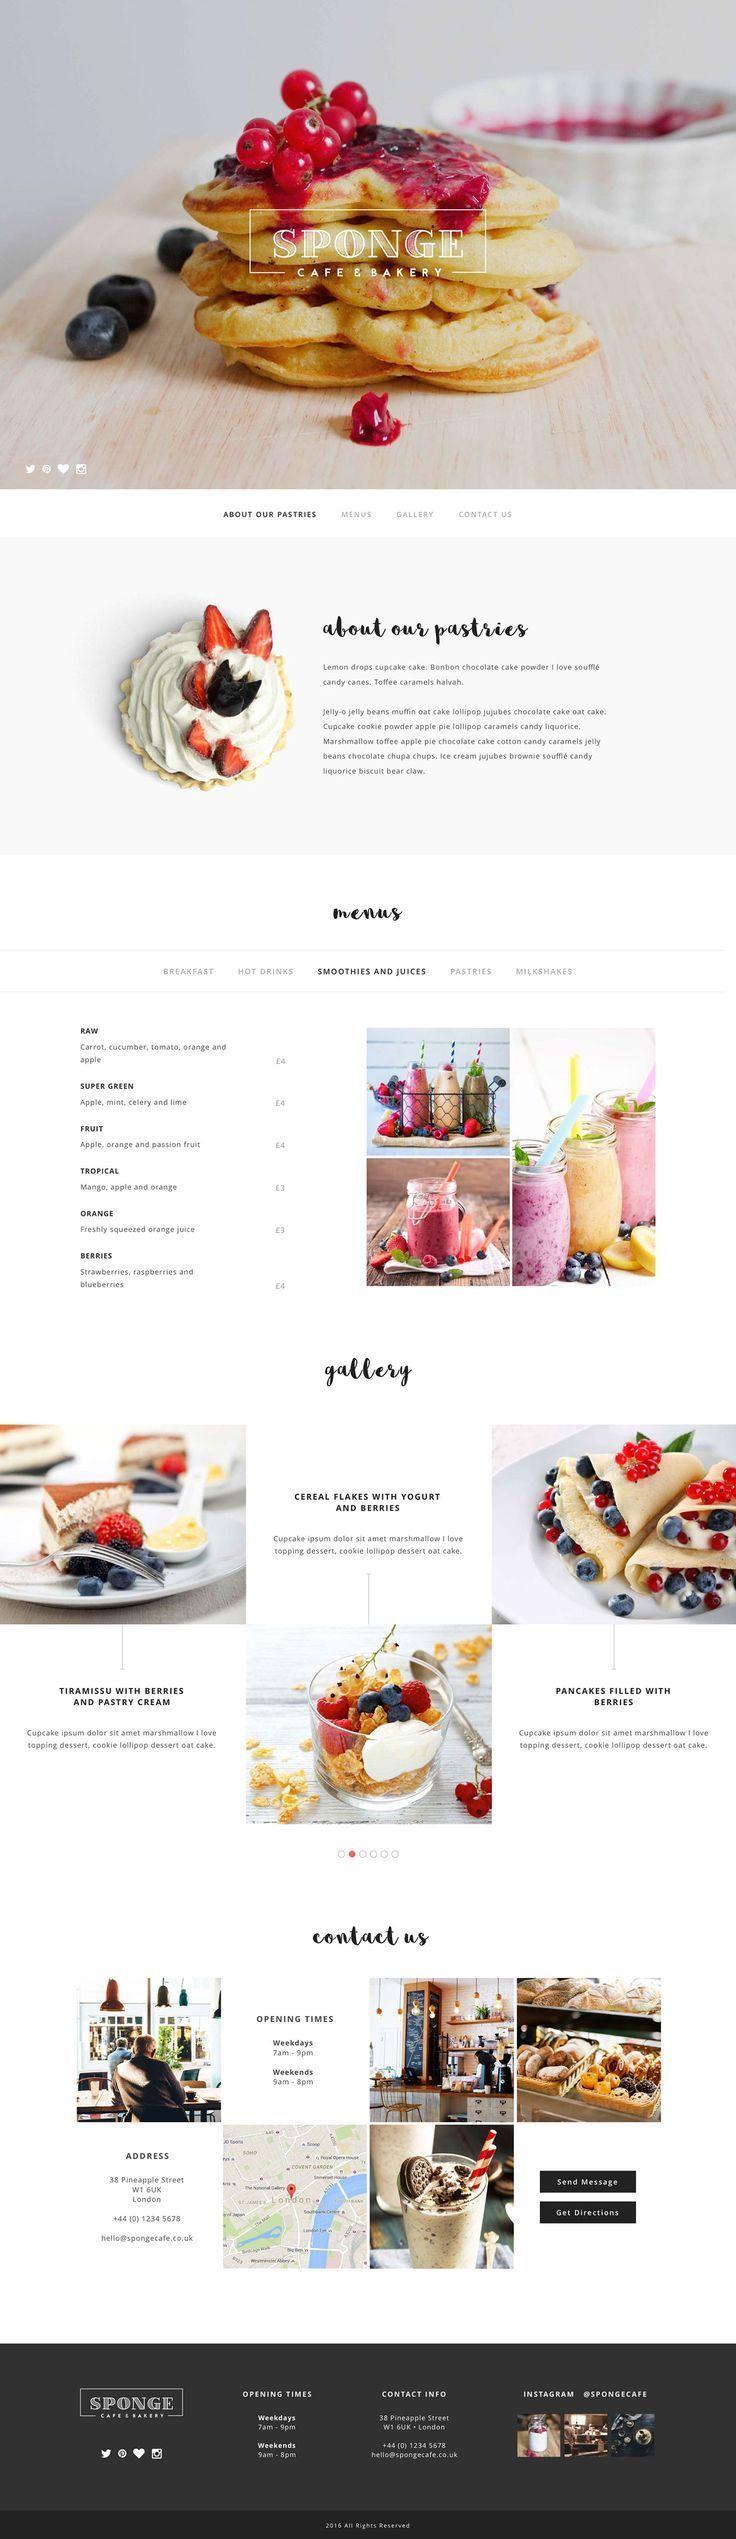 Cafe & Bakery website concept.